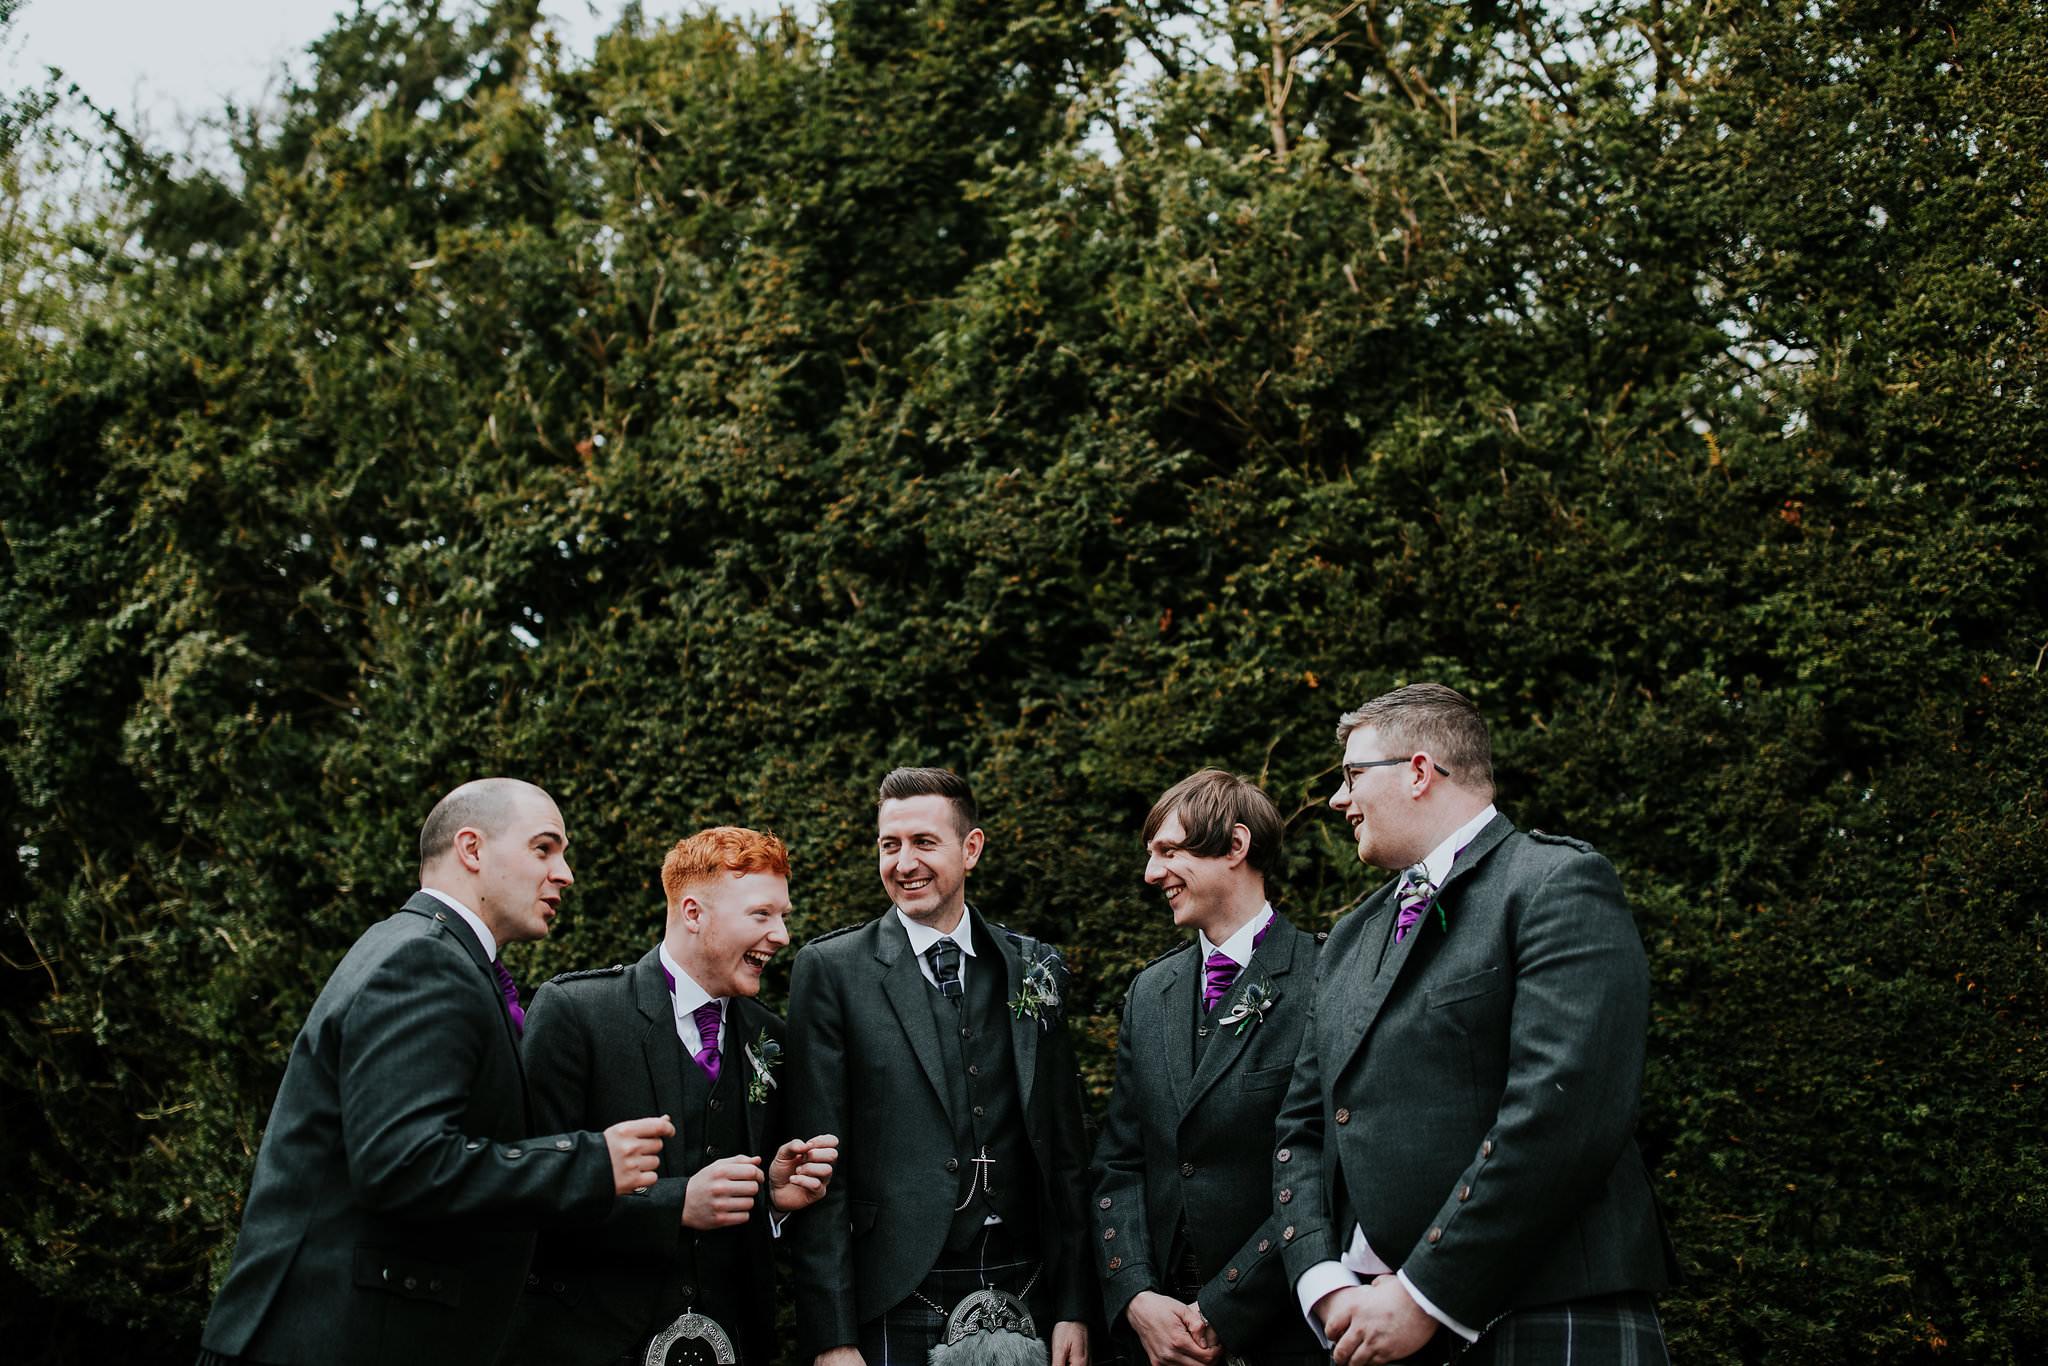 kirknewton stables wedding photographer (46).jpg